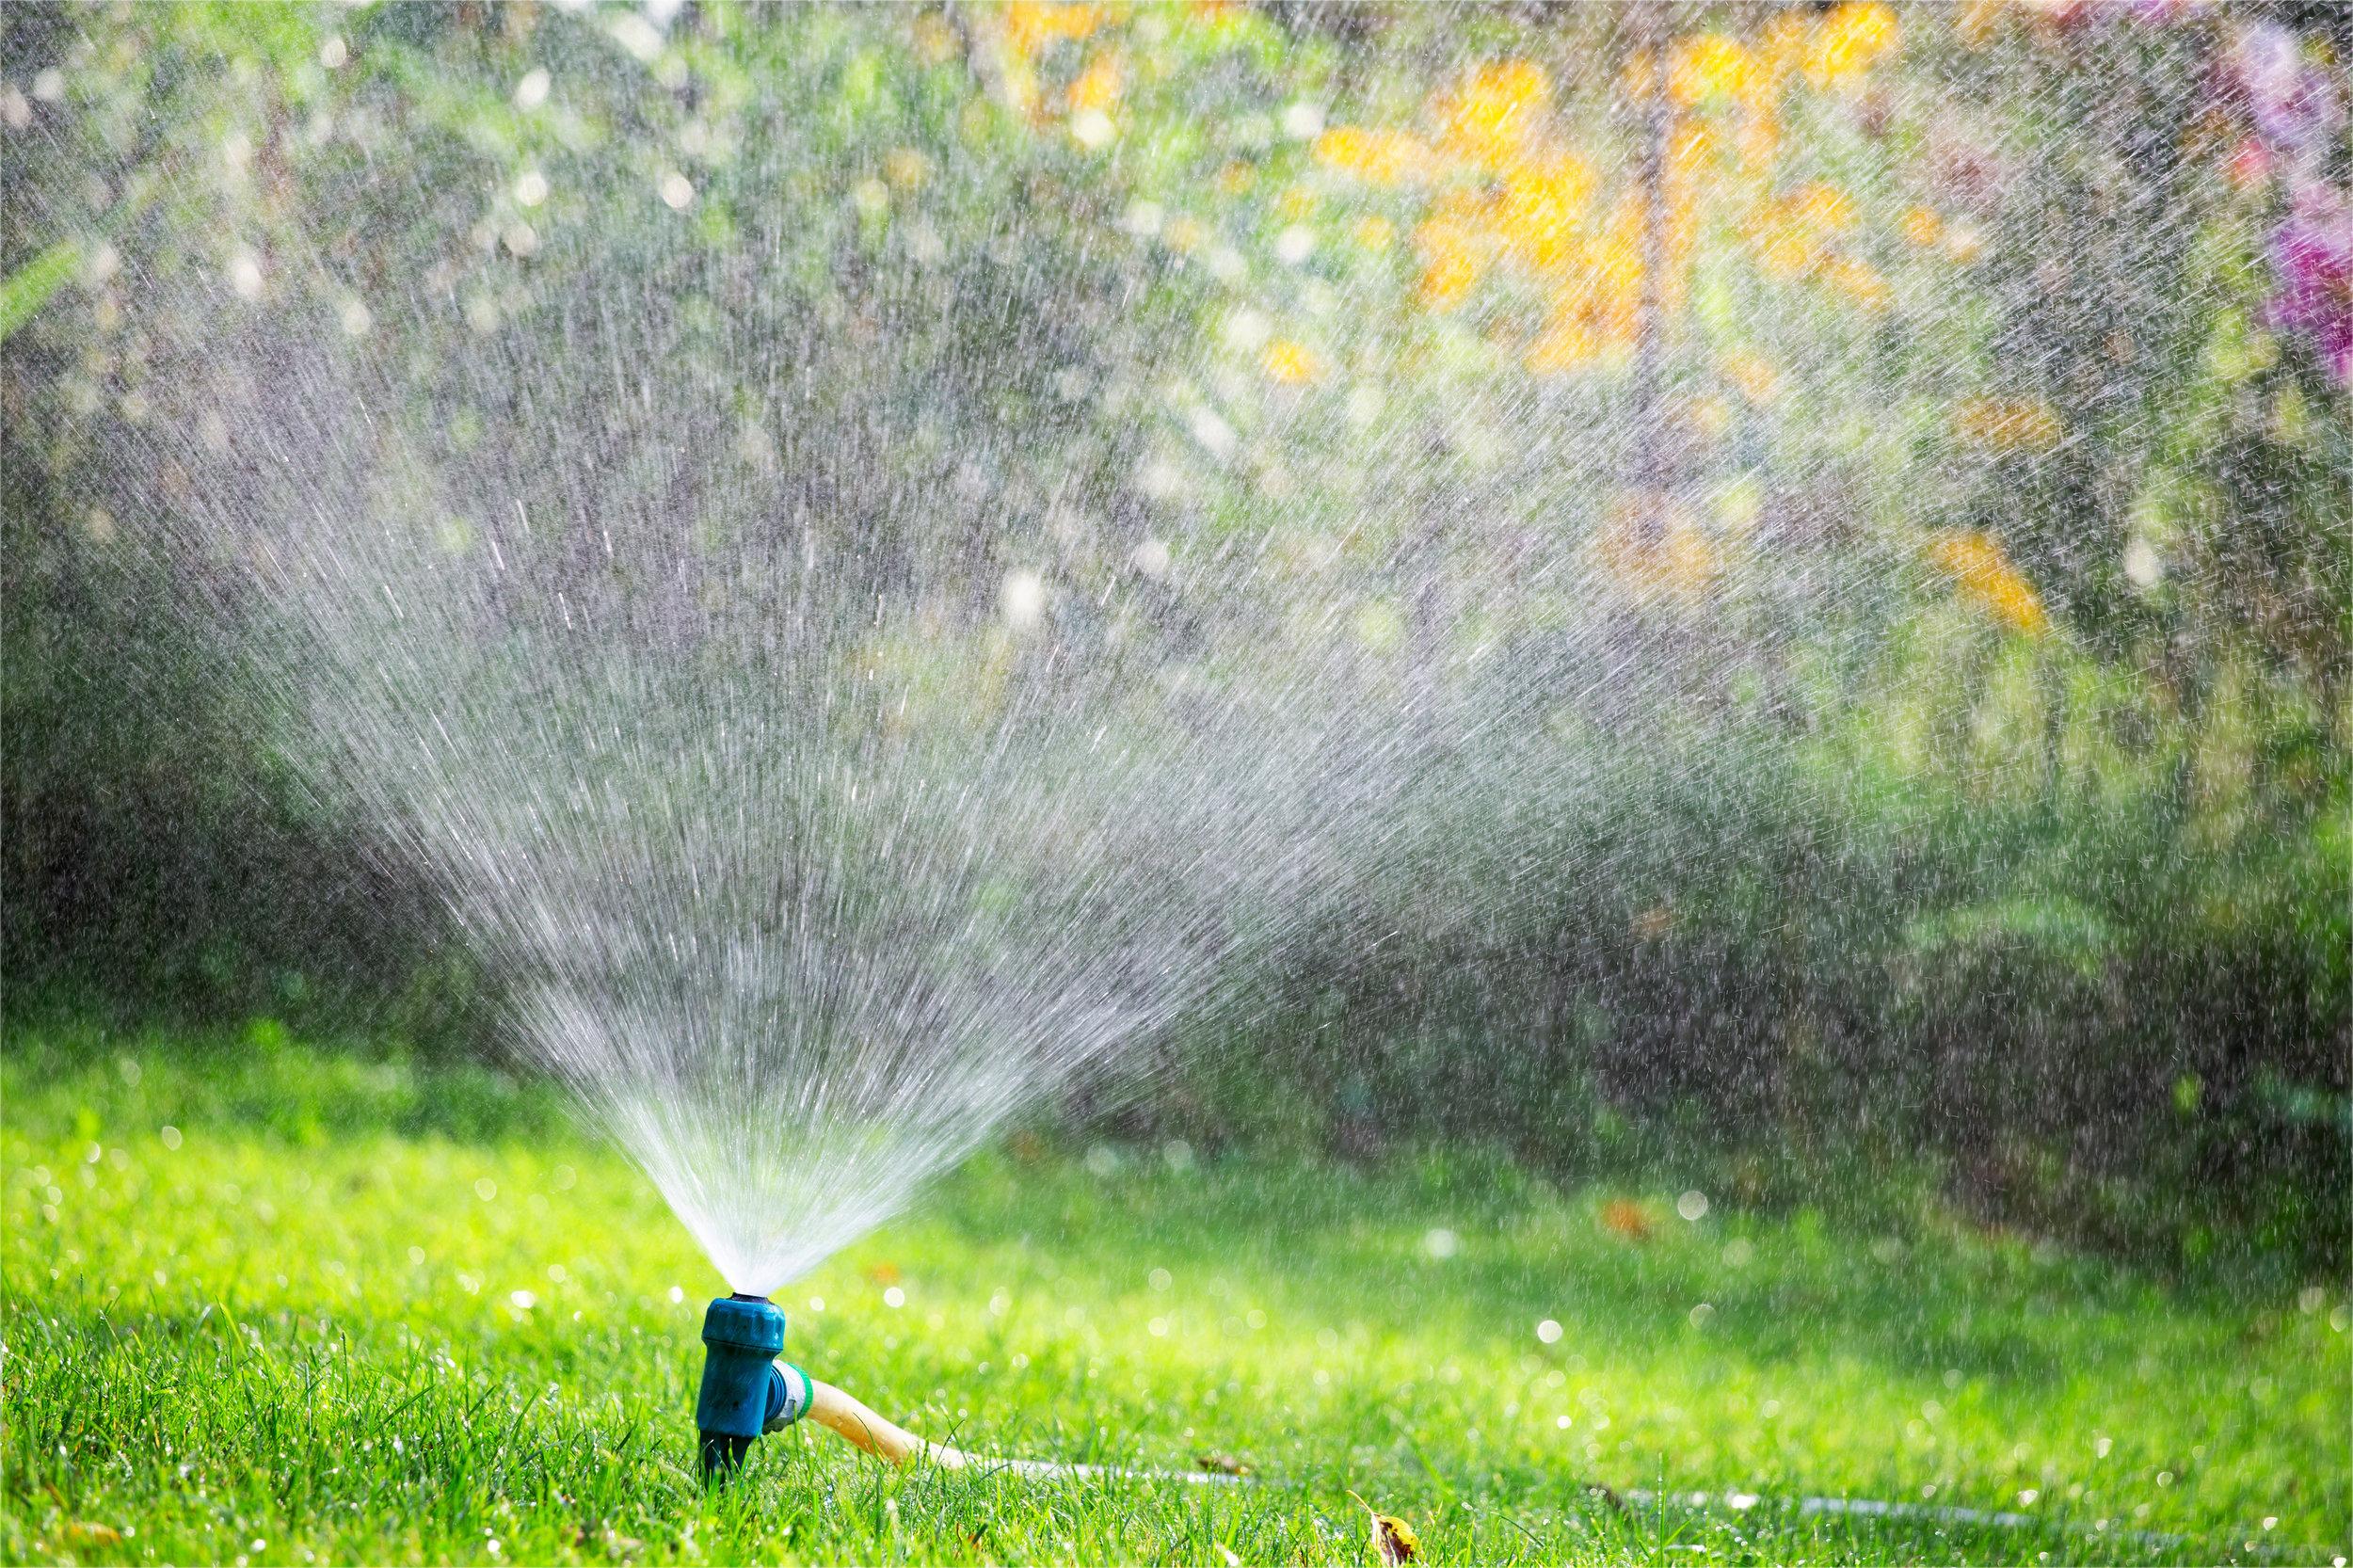 Sprinkler watering lawn in garden